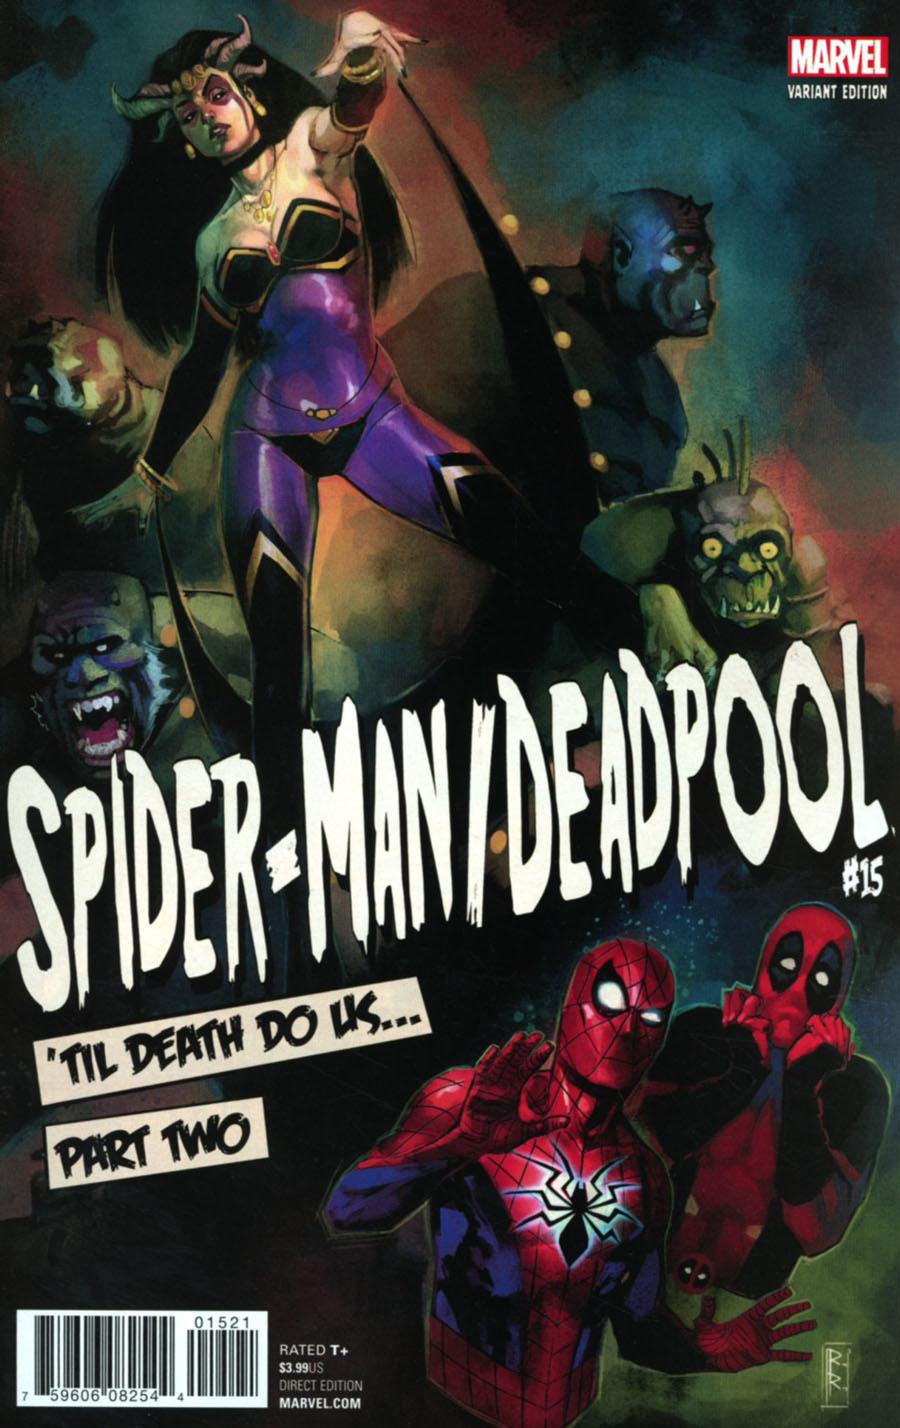 Spider-Man Deadpool #15 Cover B Variant Rod Reis Poster Cover (Til Death Do Us Part 2)